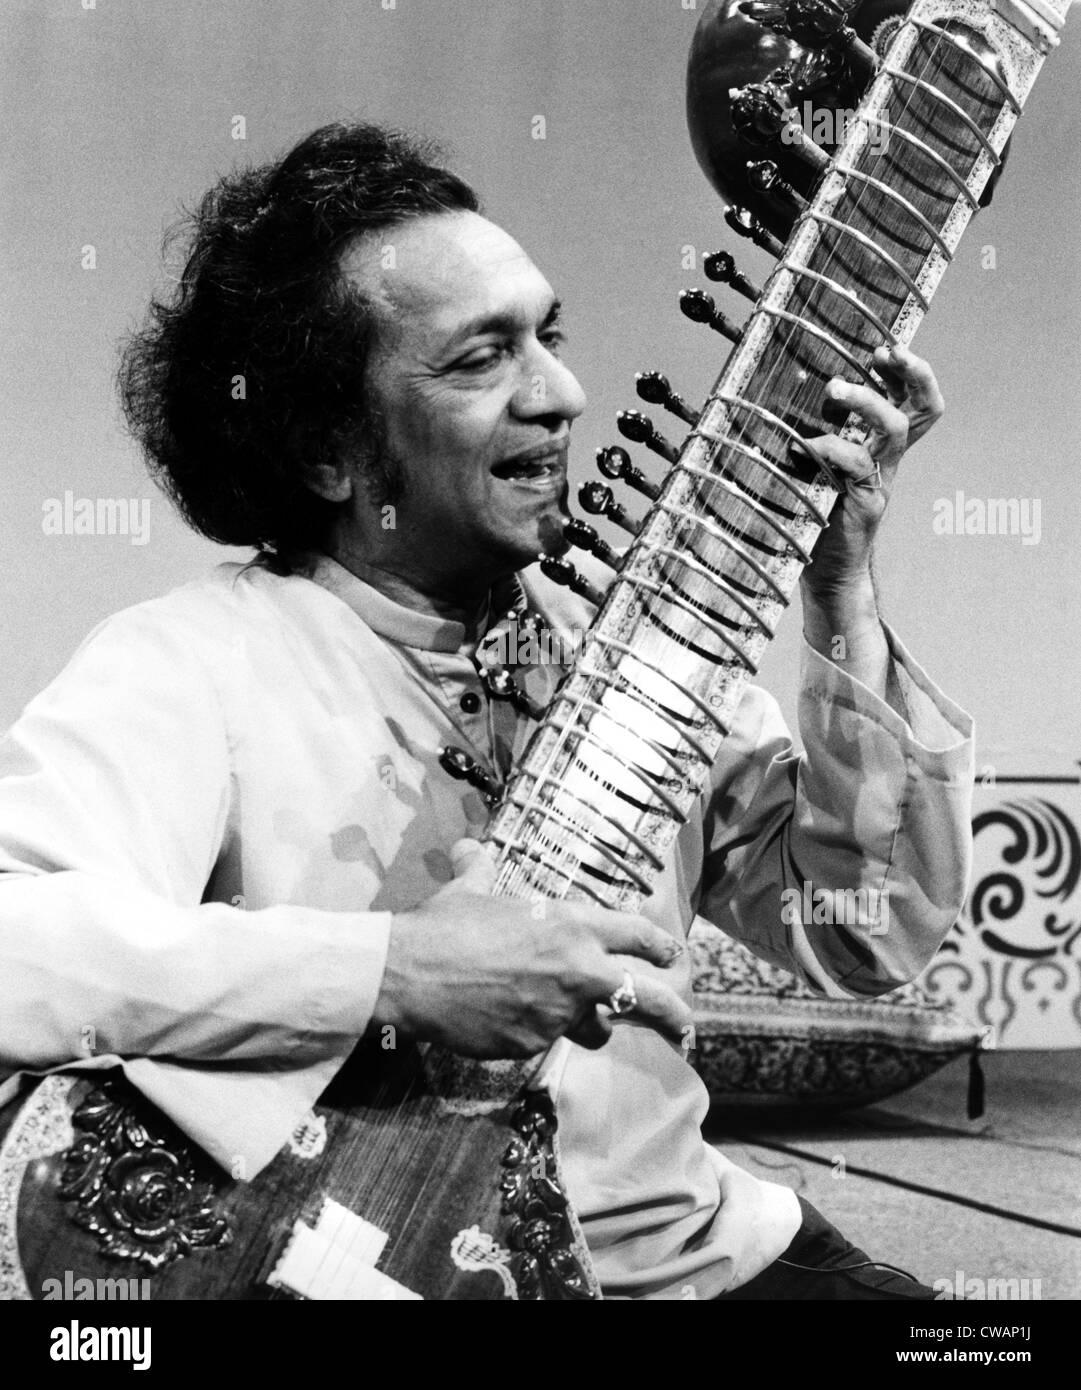 Ravi Shankar, musician, composer, performer and scholar, portrait, 1970s. Courtesy: CSU Archives / Everett Collection Stock Photo